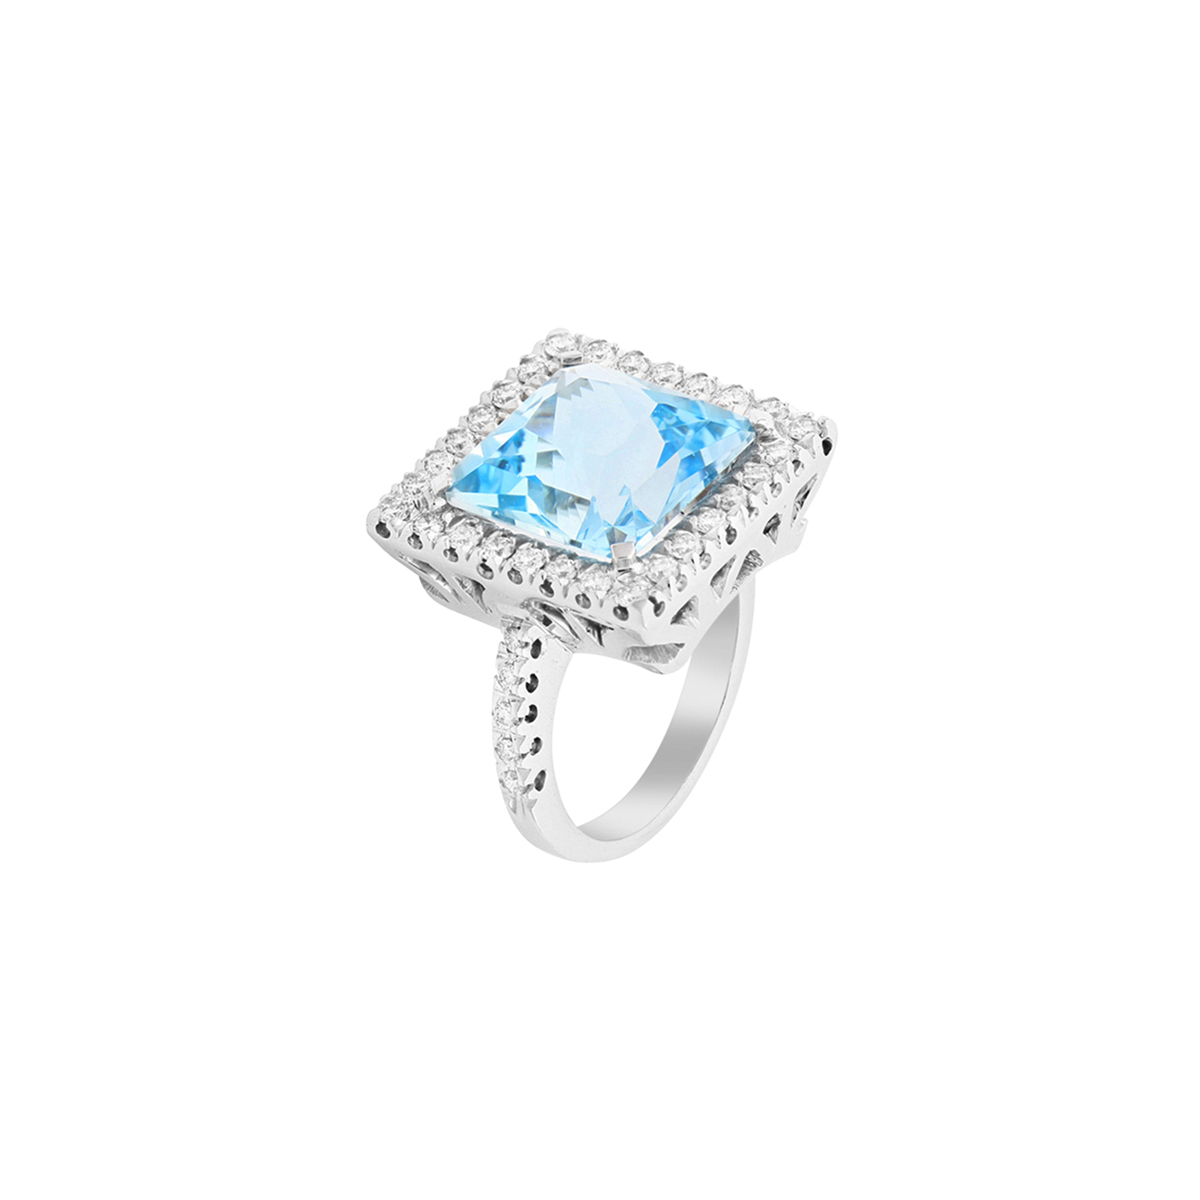 Princess Cut Topaz Ring with Diamond Halo